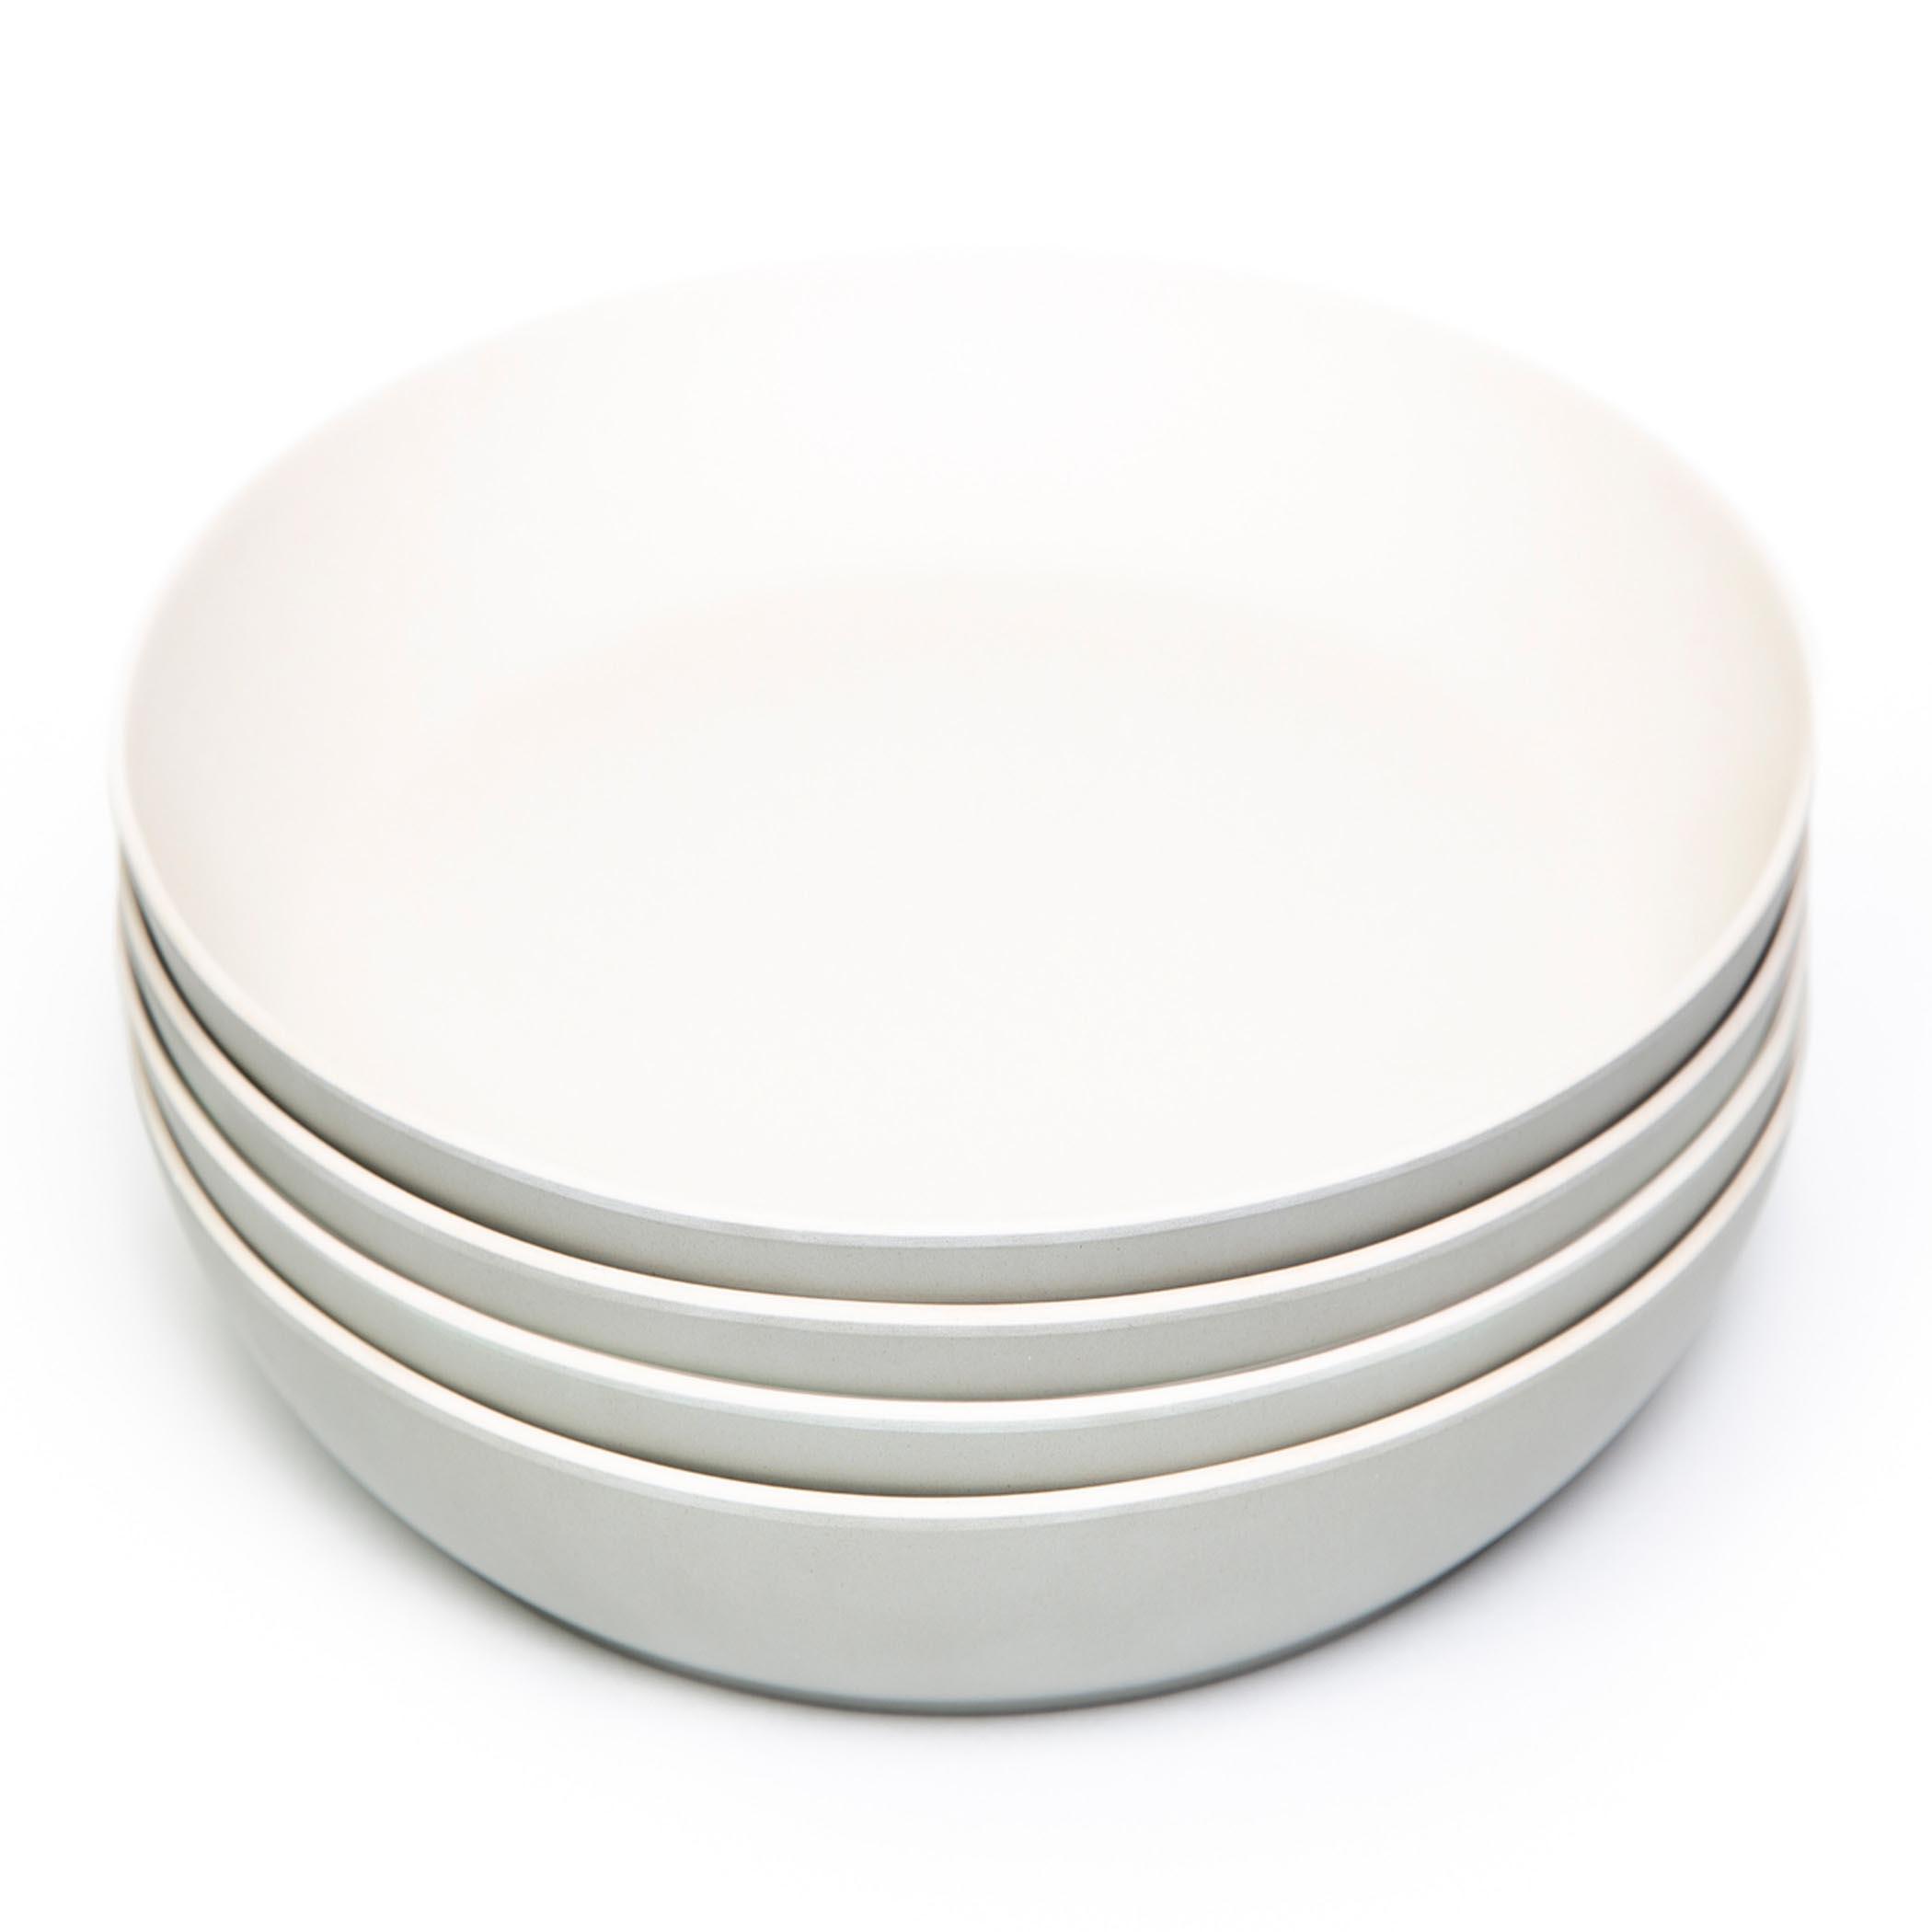 Blate Outdoor Dinnerware - Set of 4